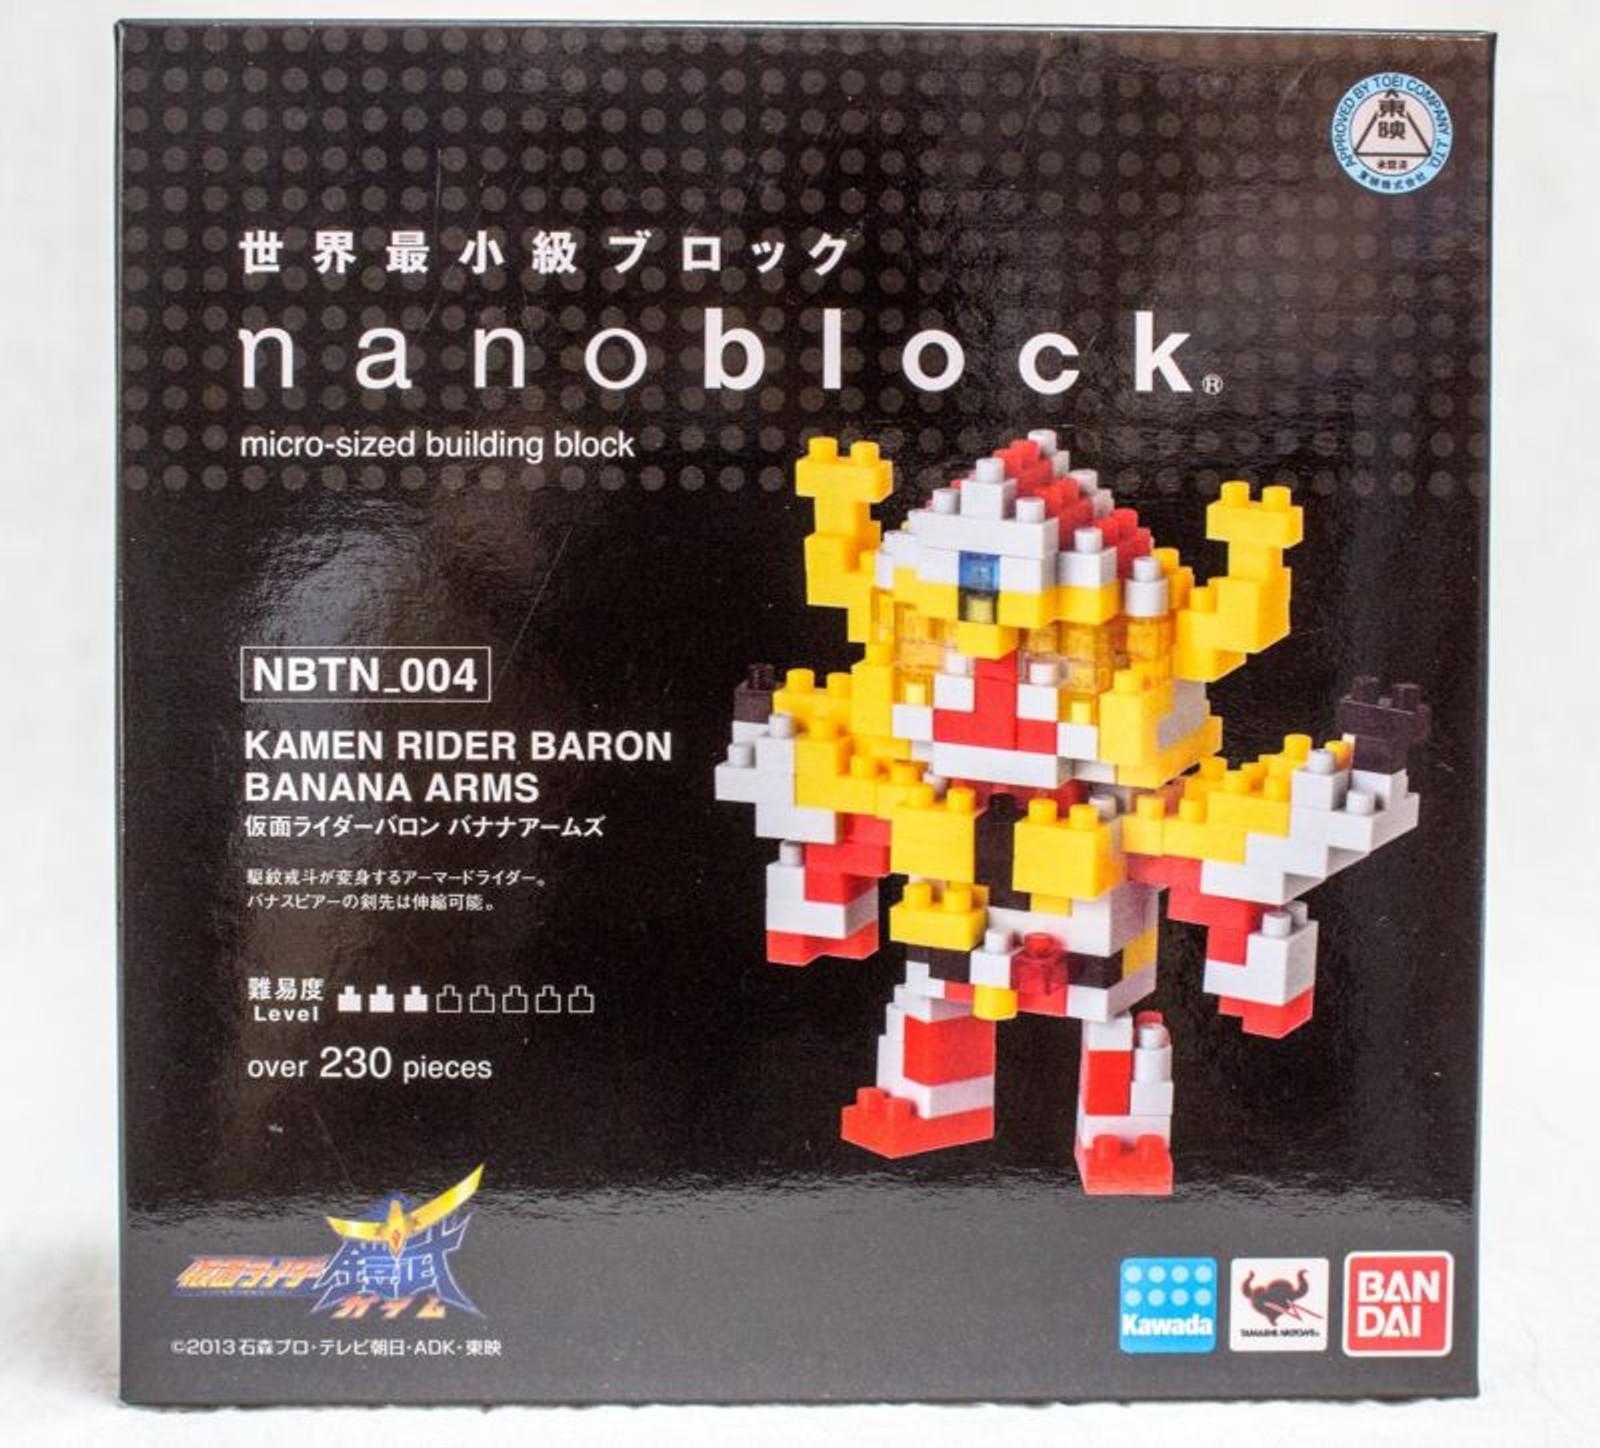 Kamen Rider Baron Banana Arms Kawada Nanoblock Nano Block NBTN-004 JAPAN Figure